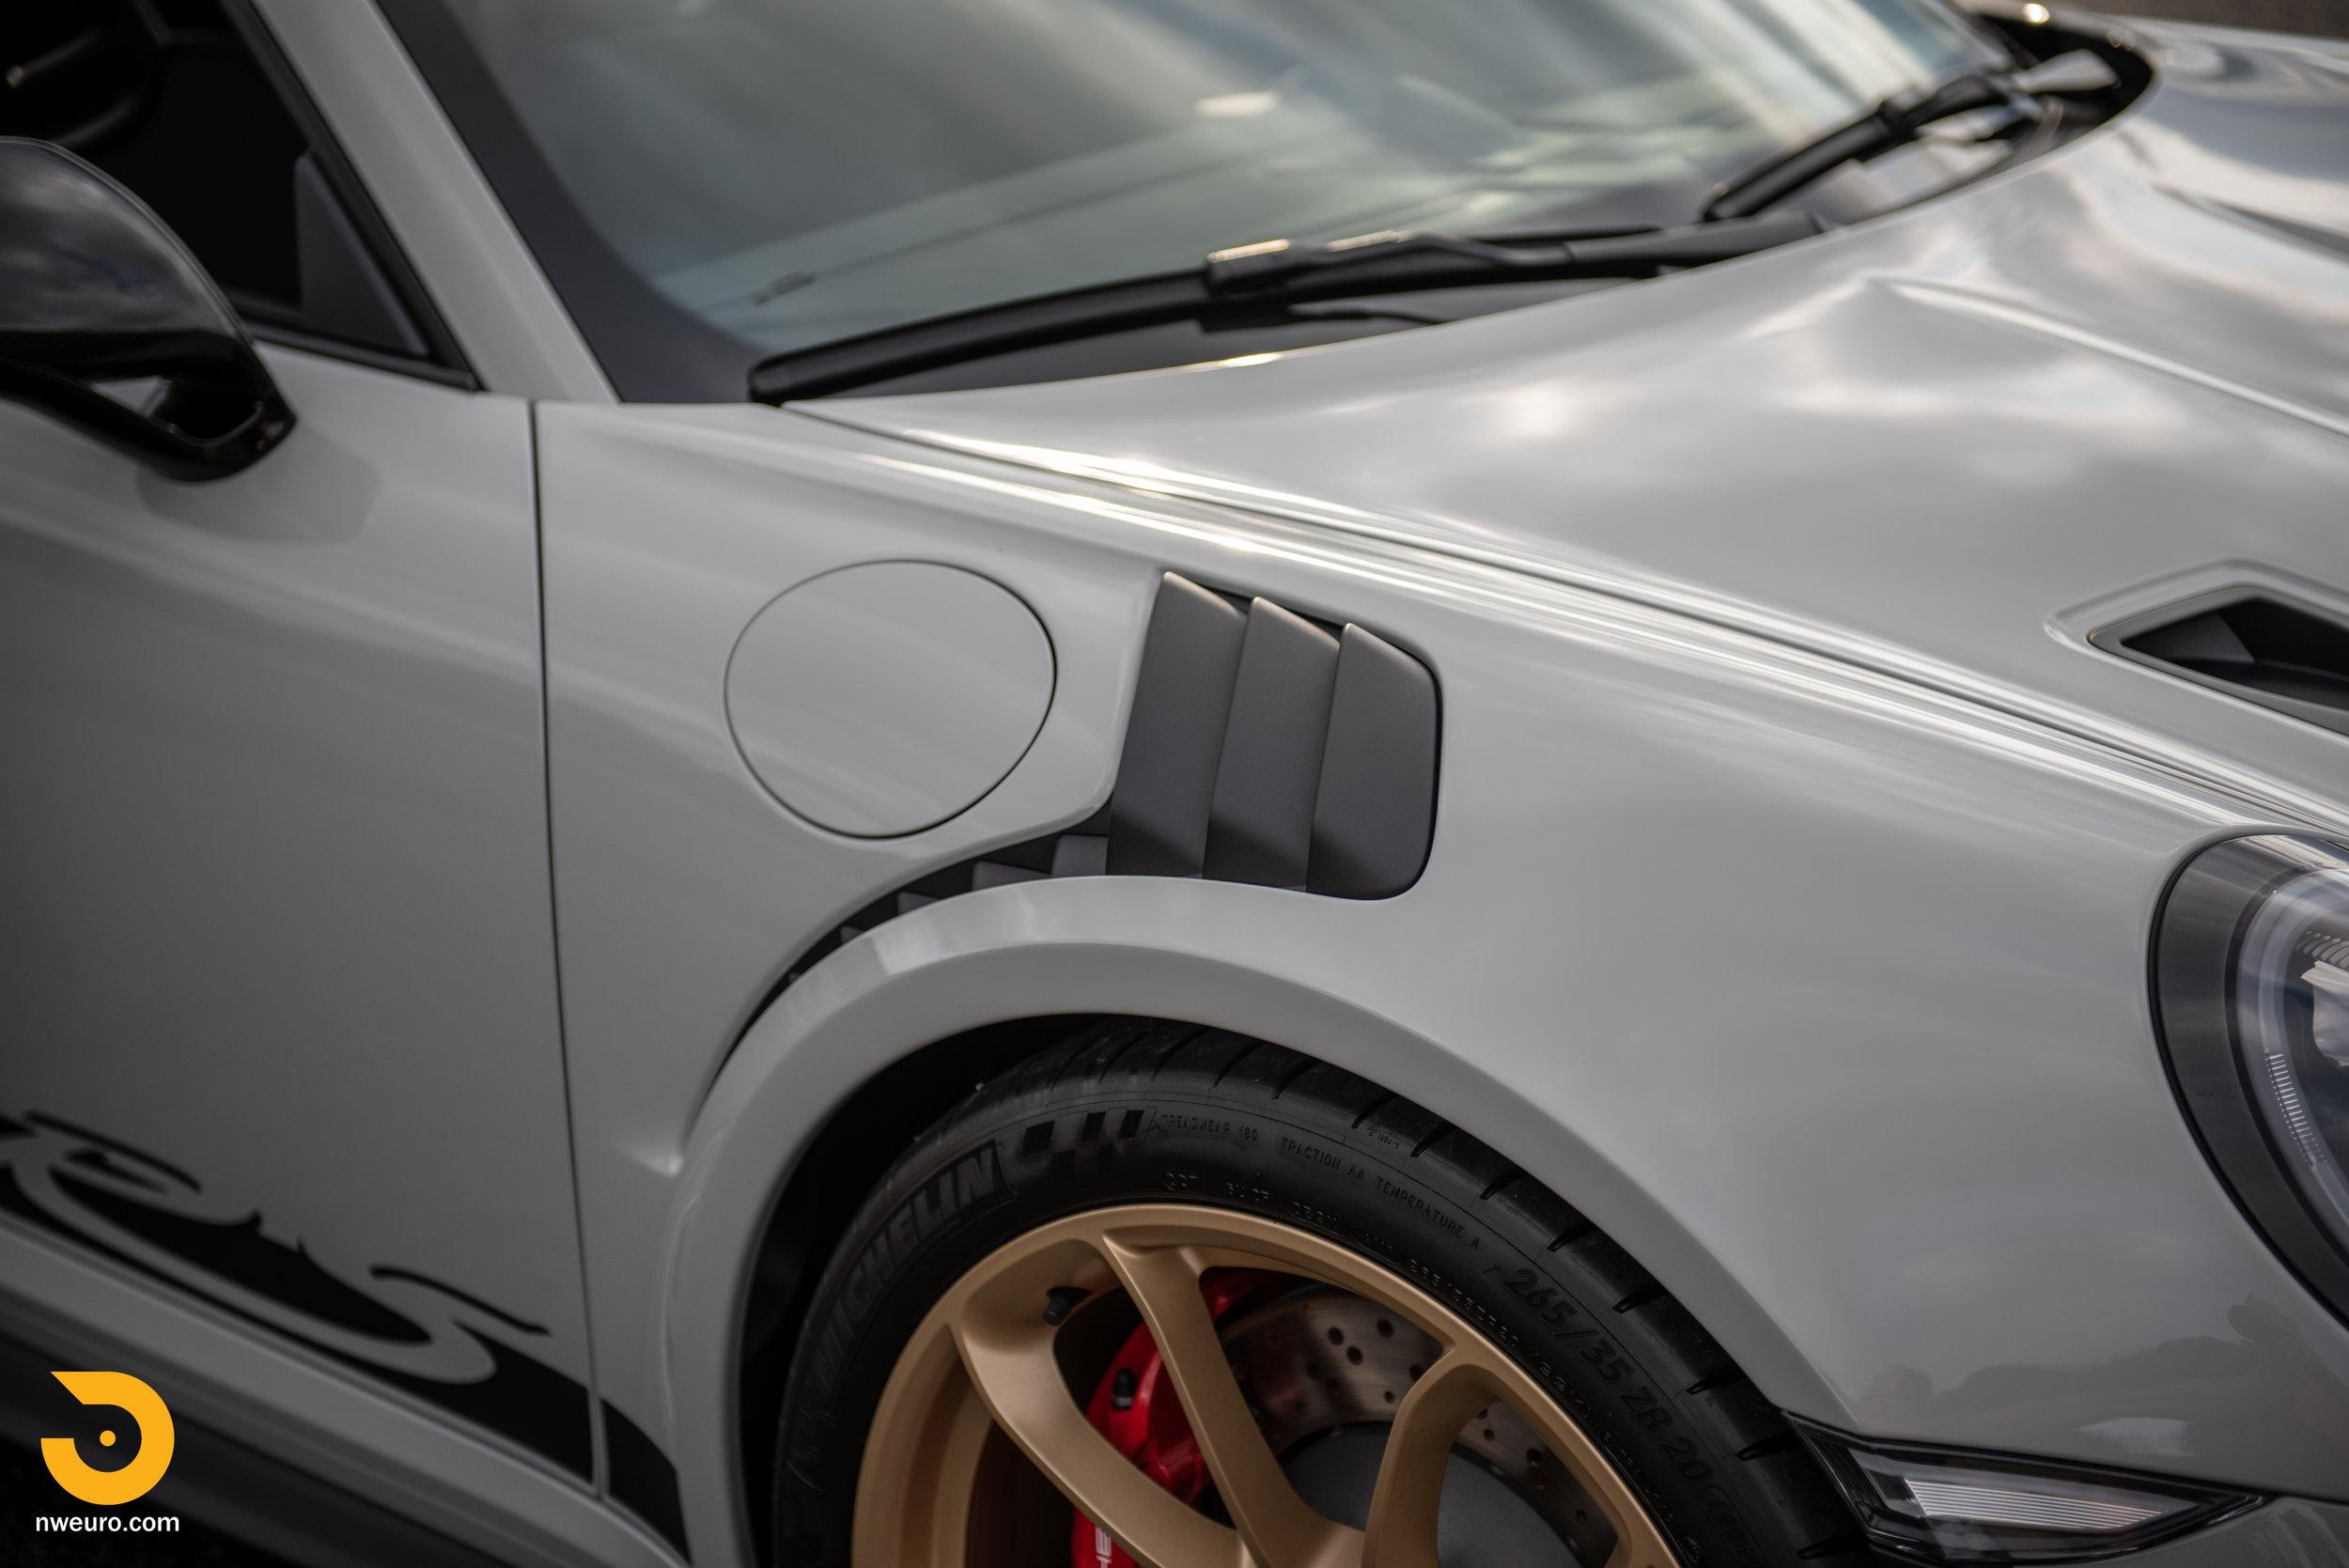 2019 Porsche GT3 RS - Chalk-17.jpg